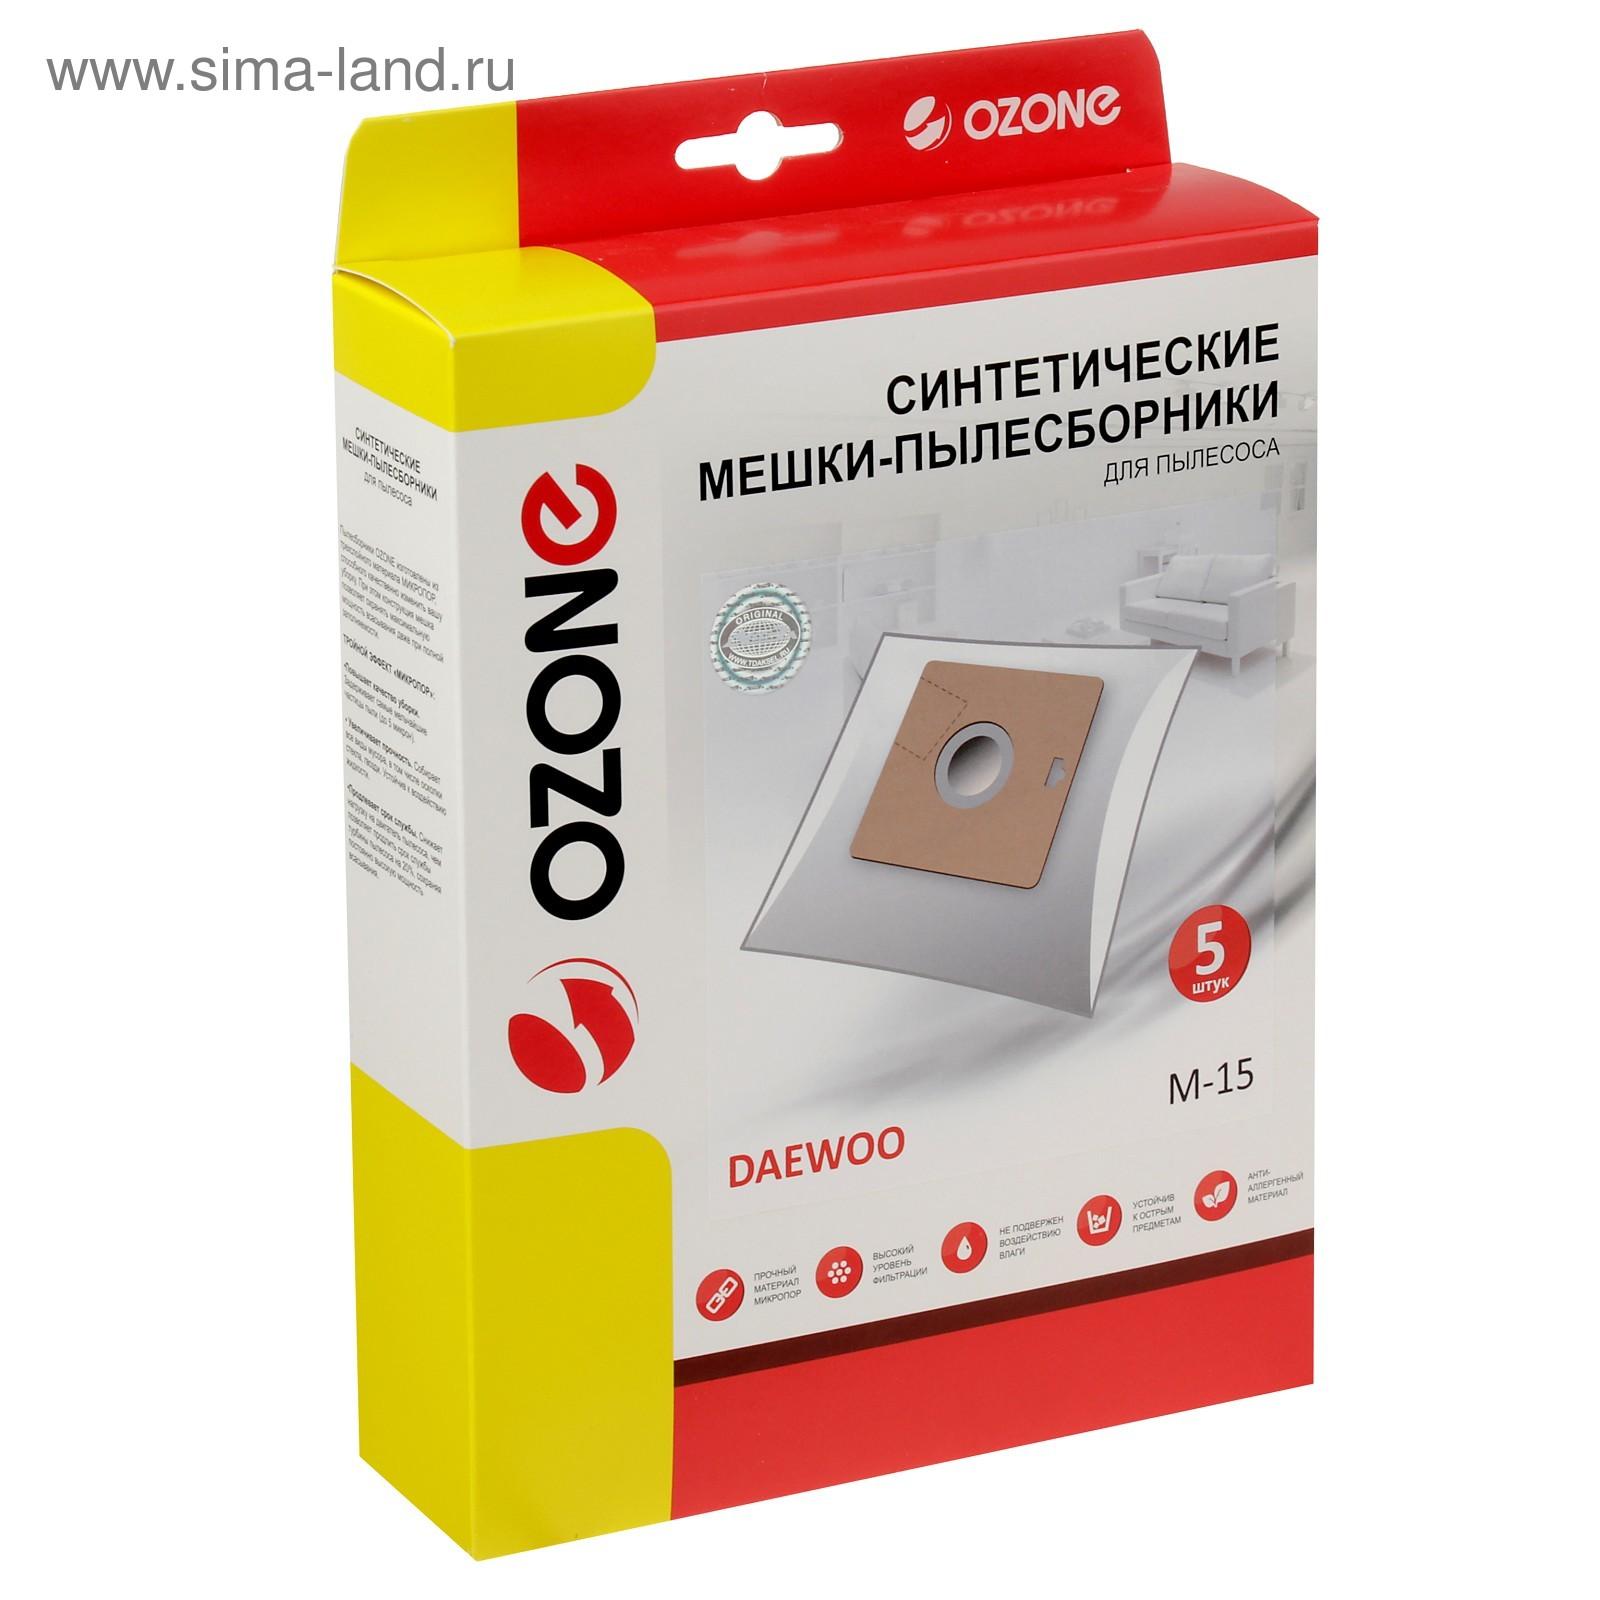 Синтетический пылесборник Ozone micron M-15, 5 шт (Daewoo) (2463628 ... 875042ab0ff